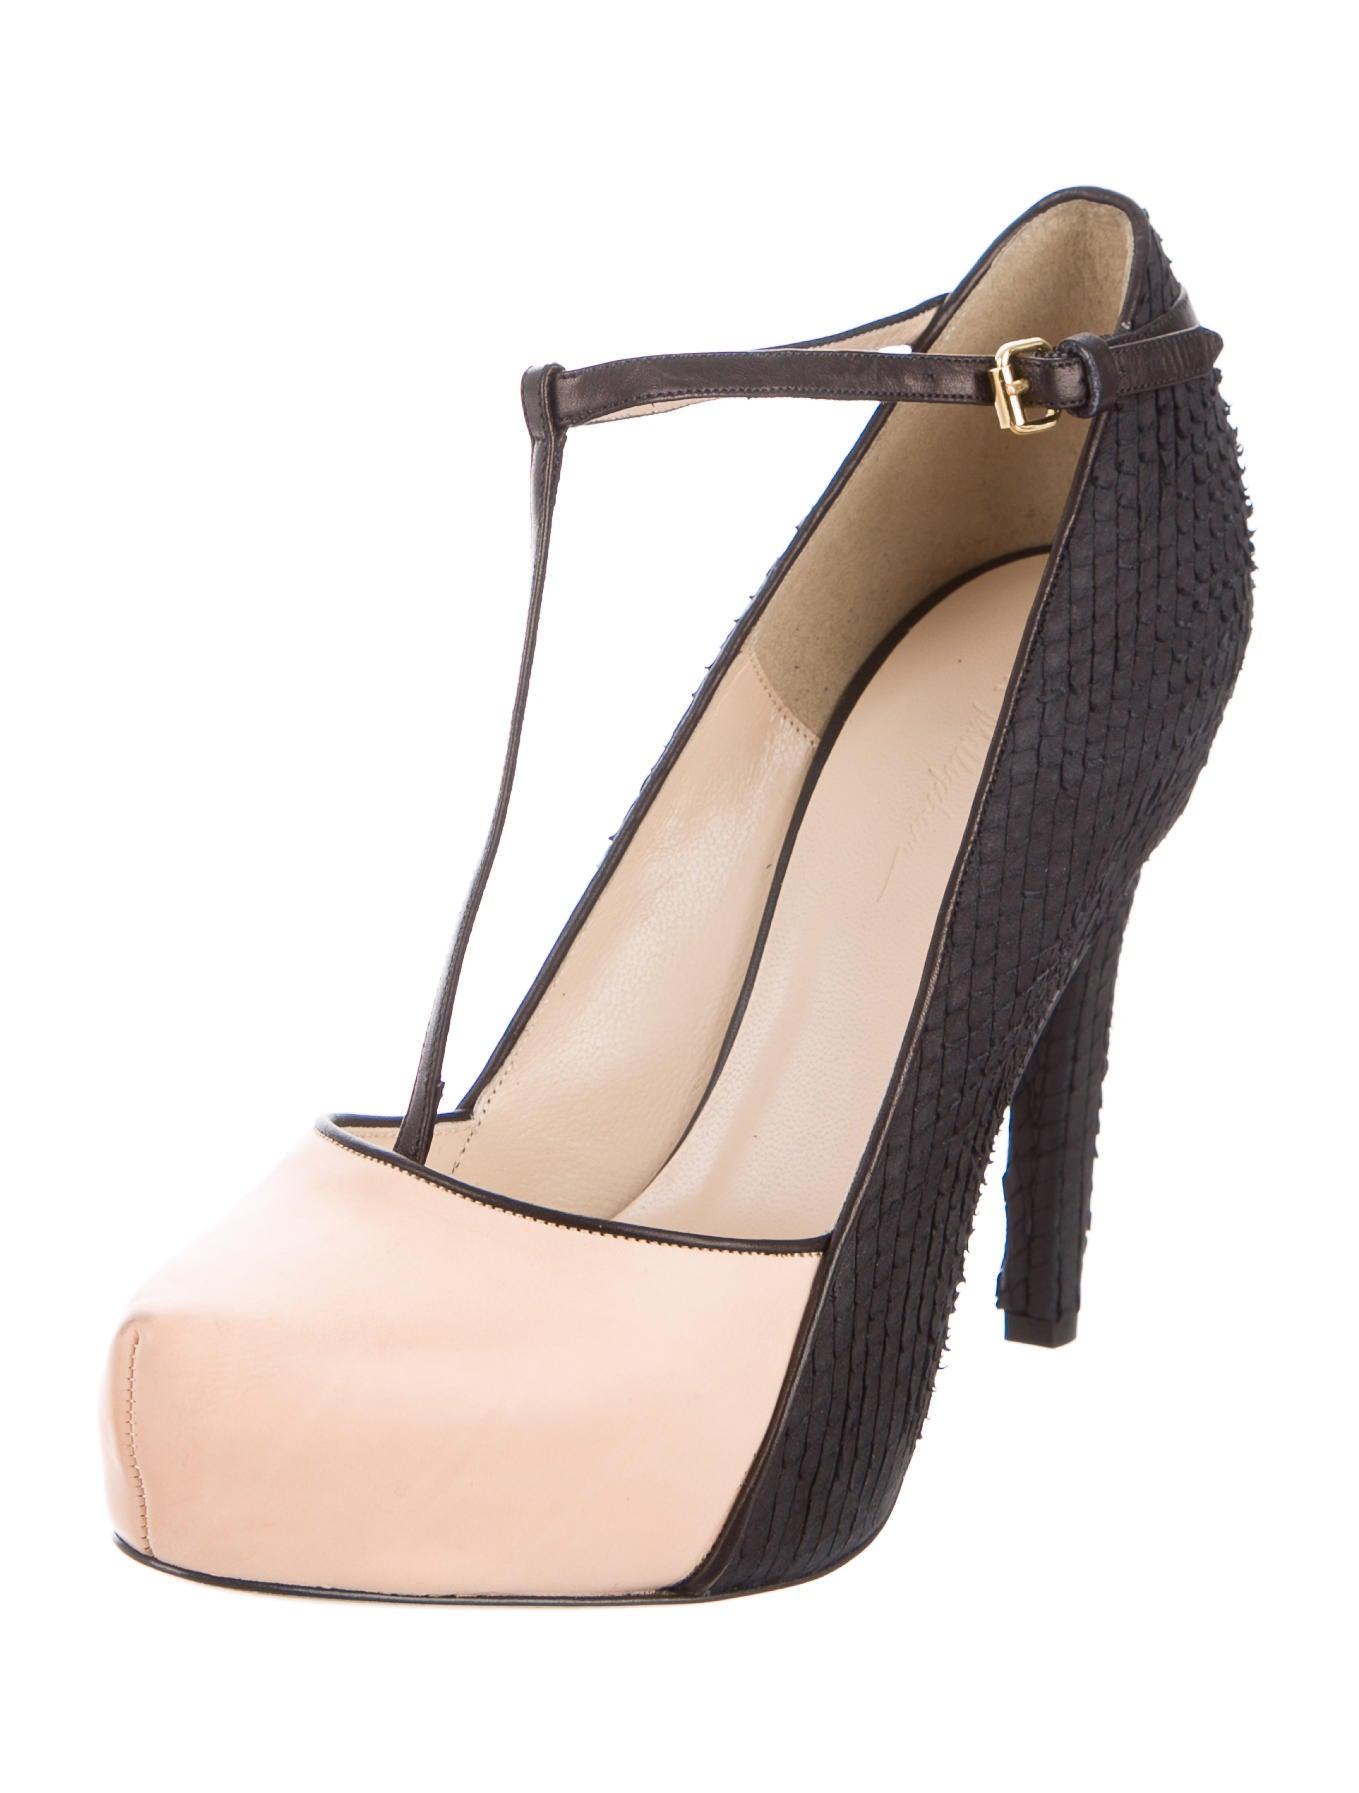 3 1 phillip lim platform t strap pumps shoes w31ph41789 the realreal. Black Bedroom Furniture Sets. Home Design Ideas